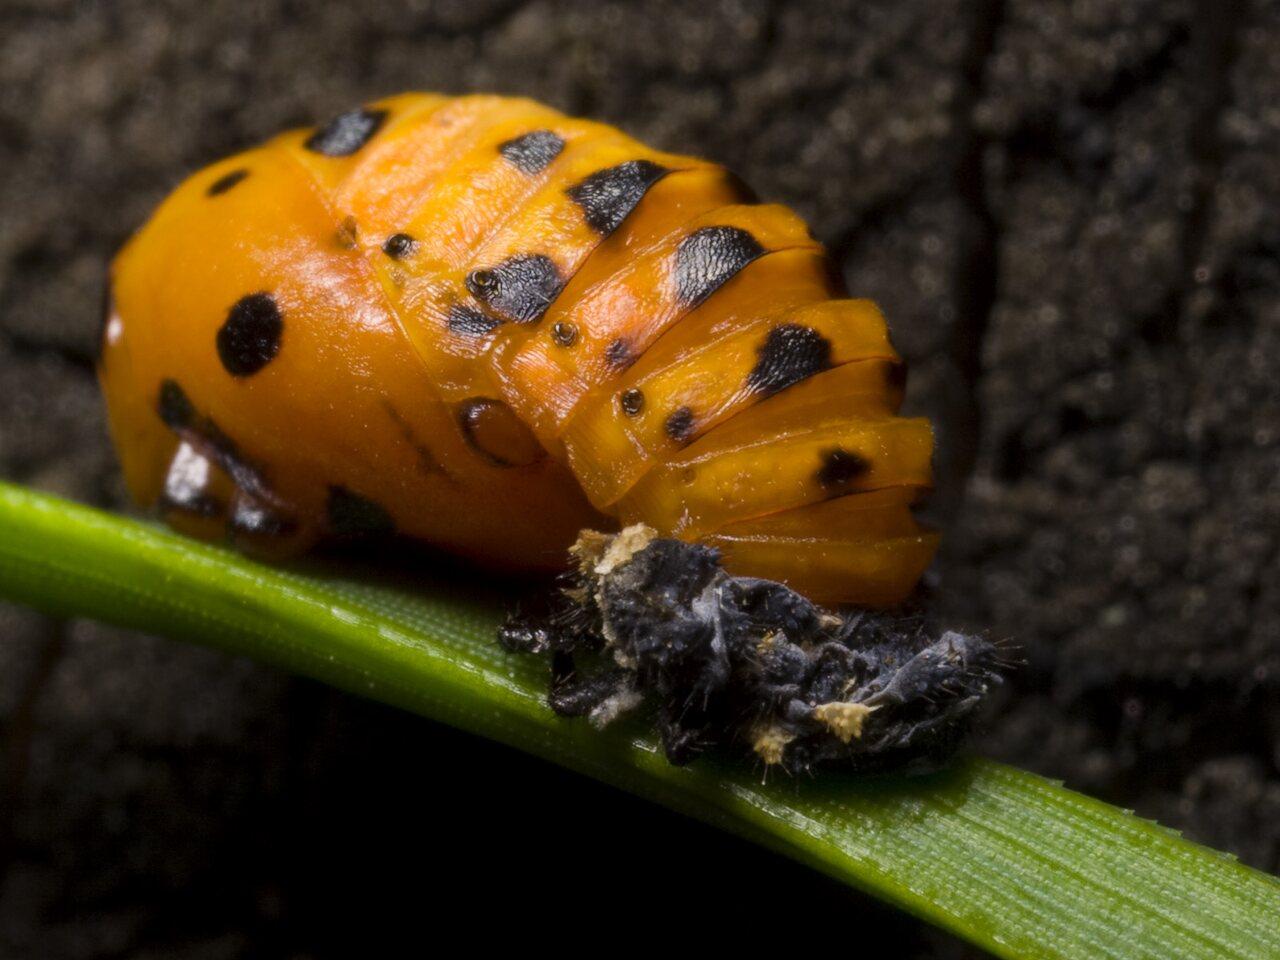 Coccinella-septempunctata-1090.jpg